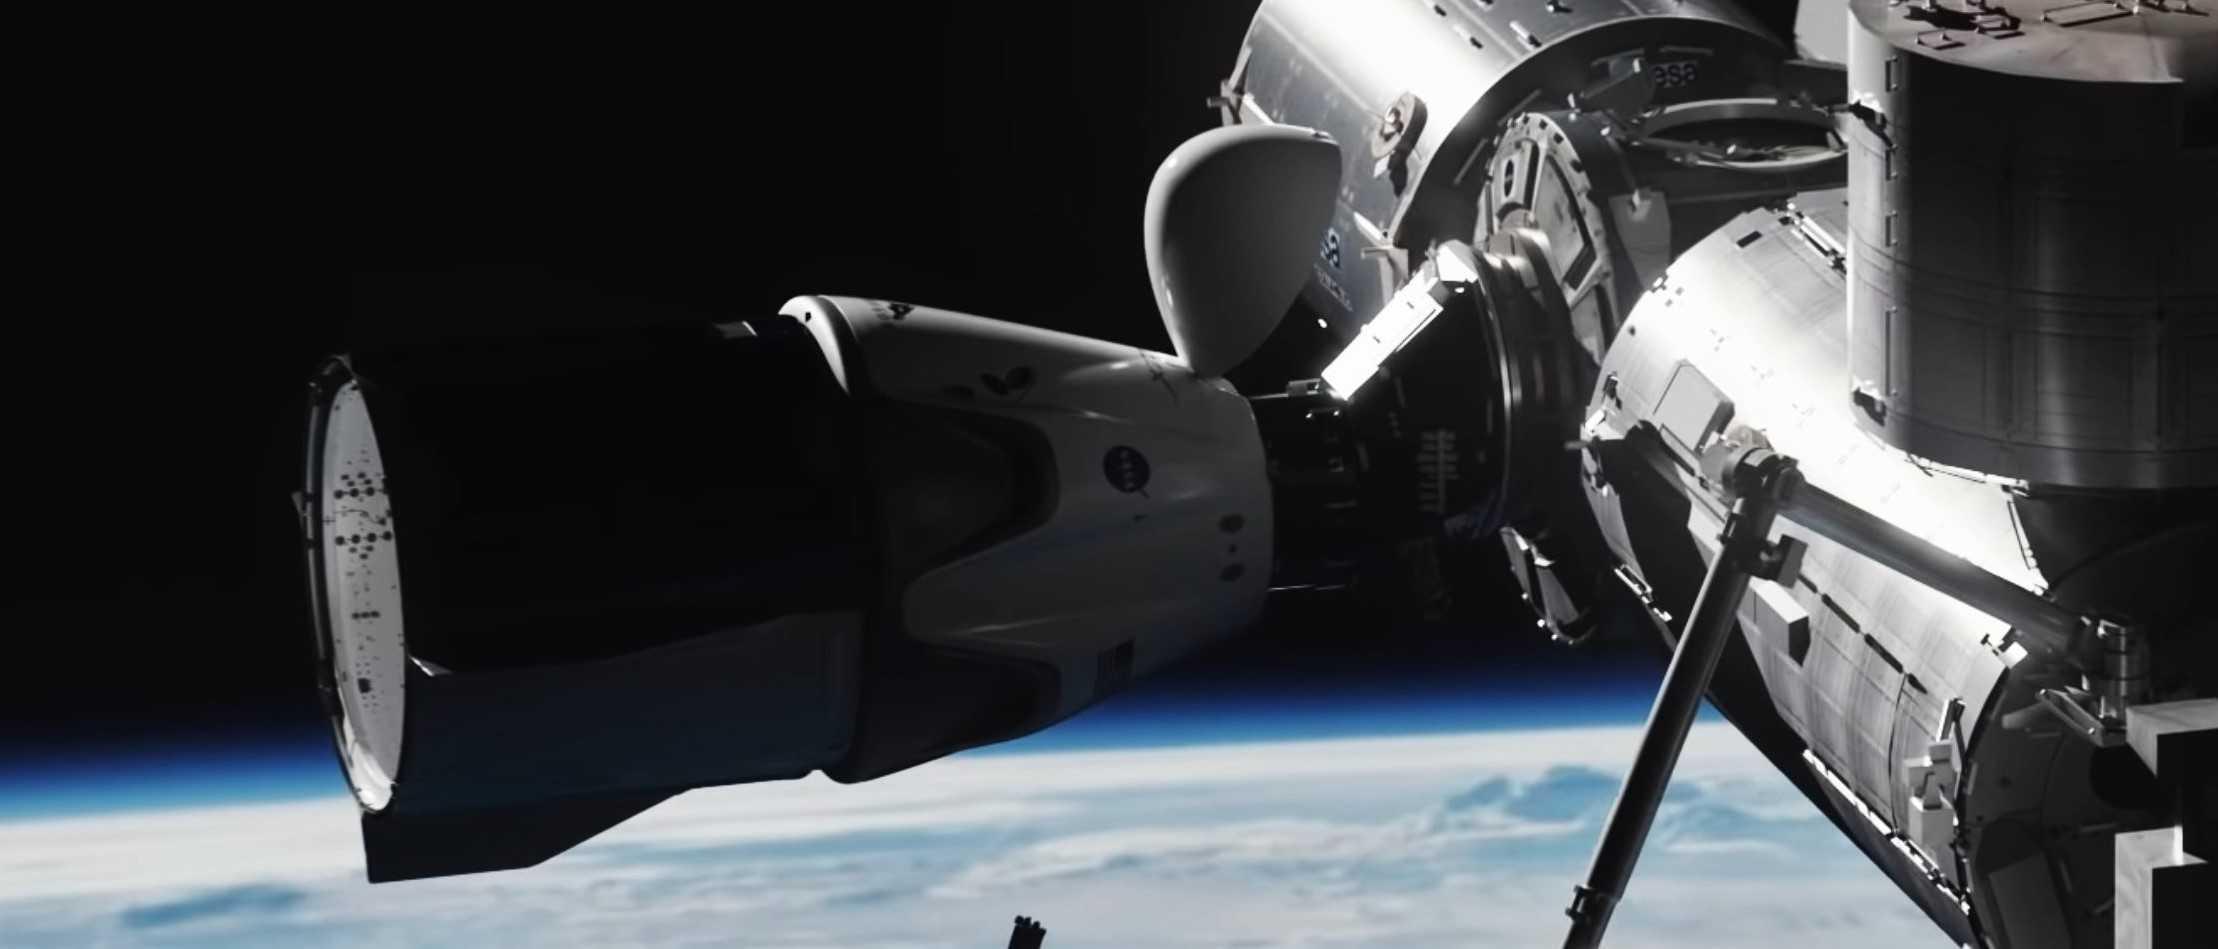 Crew Dragon Demo-2 animation Dec 2019 (SpaceX) ISS 6 crop (c)